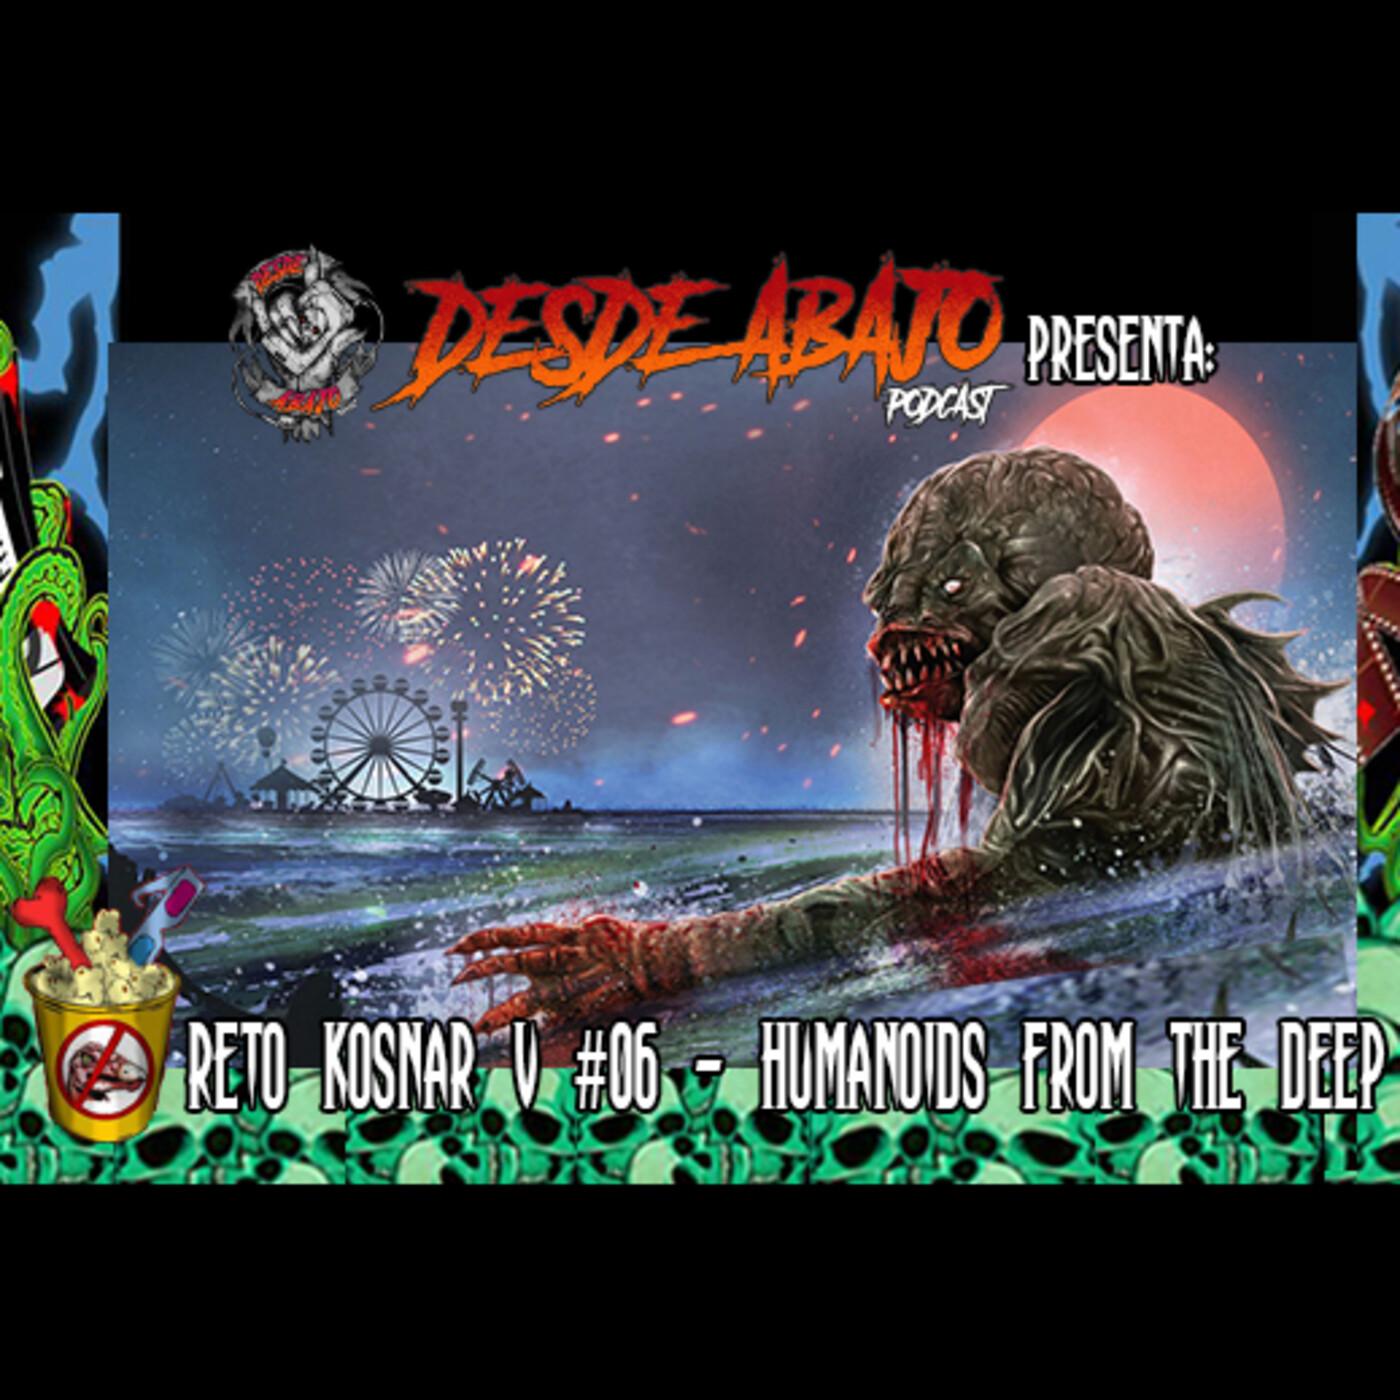 Reto Kosnar V #06- Humanoids From the Deep